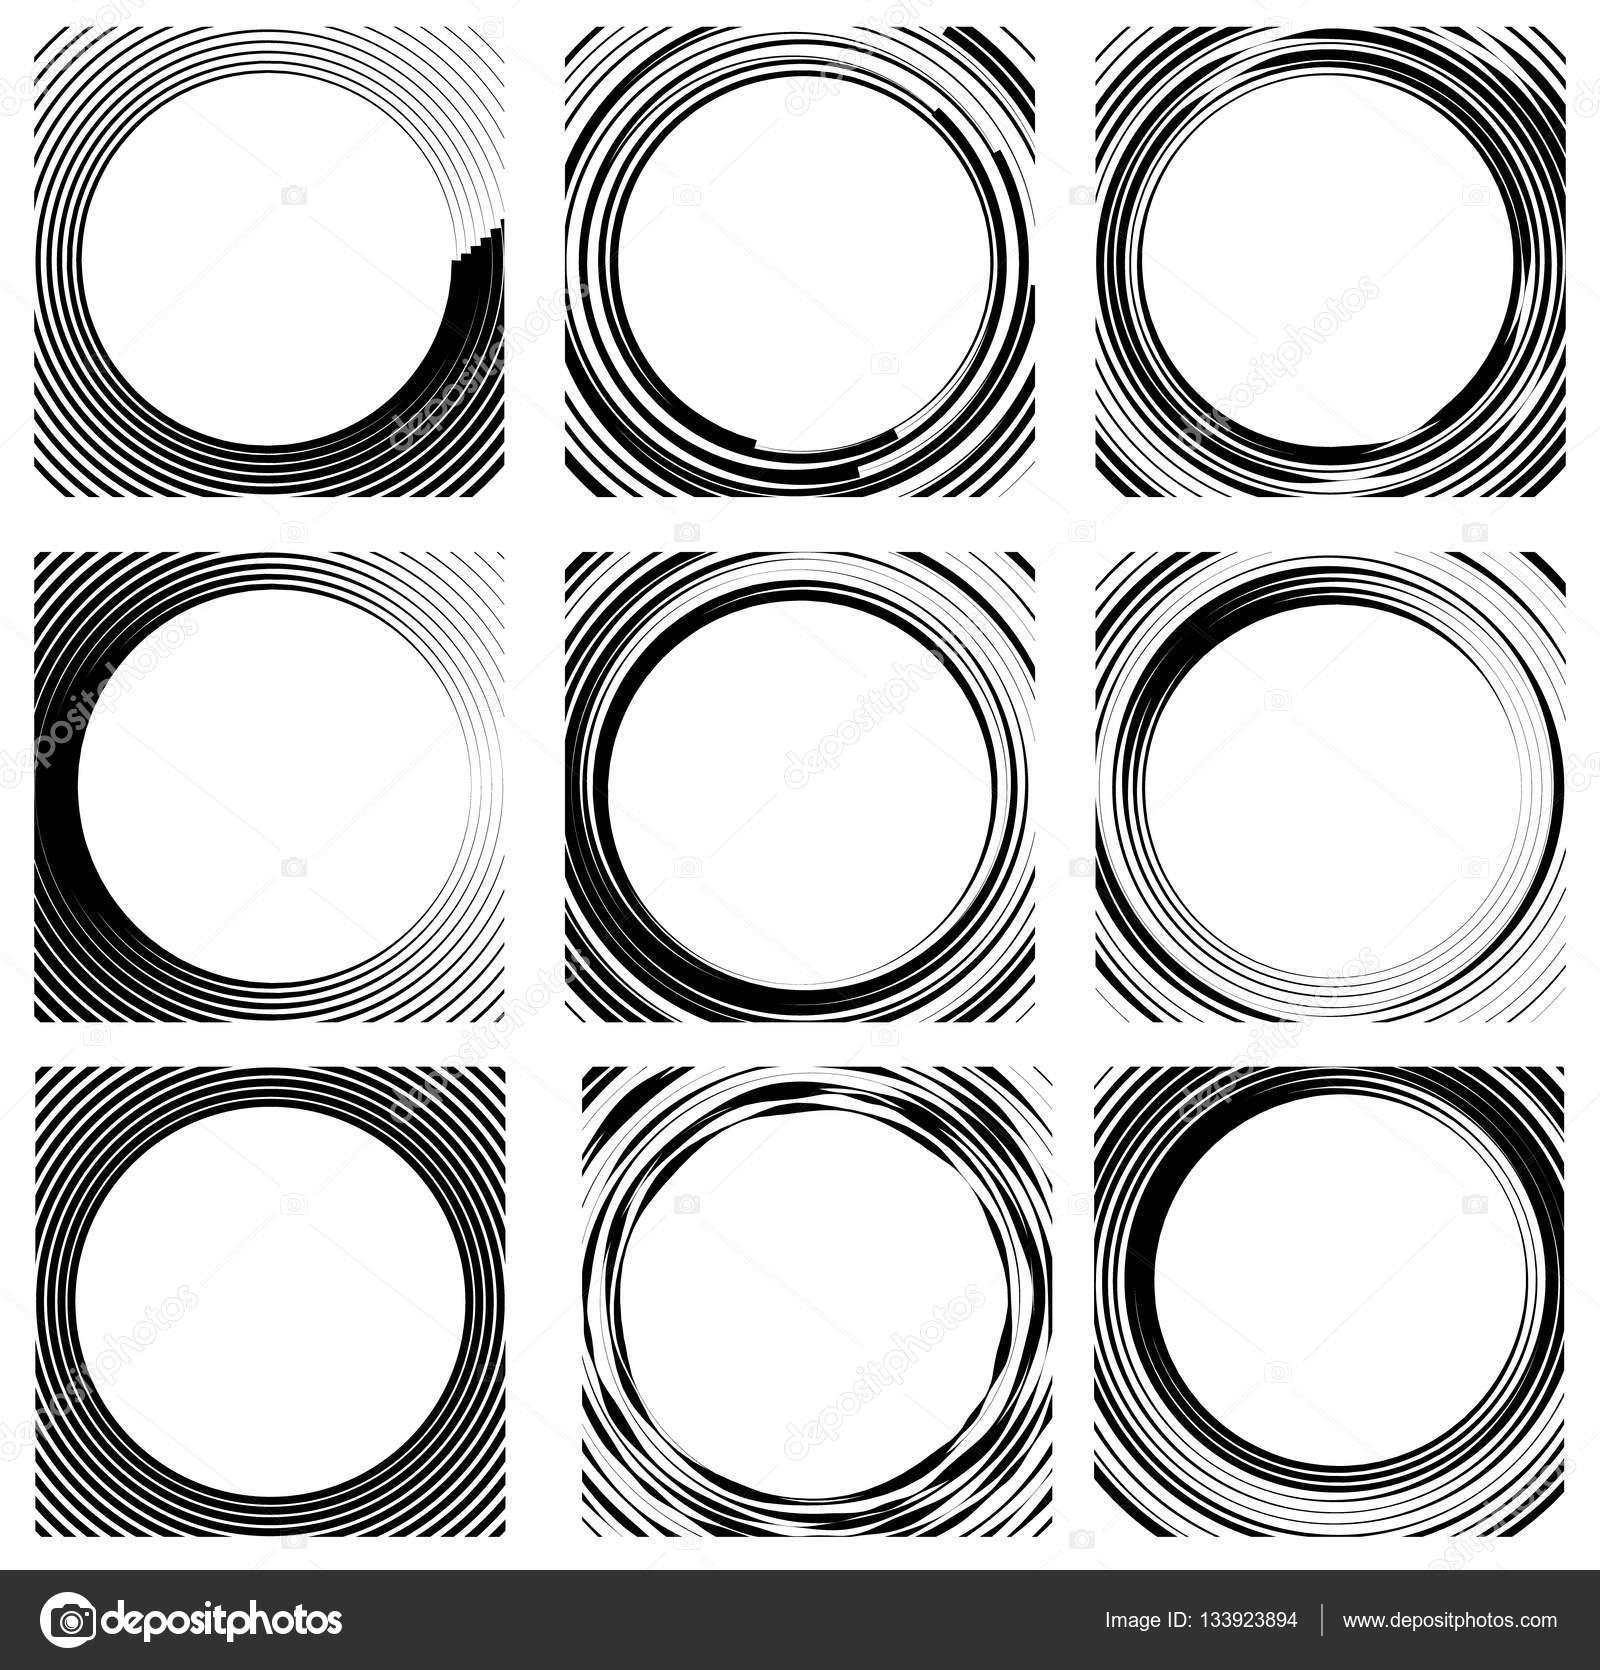 ppt 背景 背景图片 边框 模板 设计 矢量 矢量图 素材 相框 1600_1670